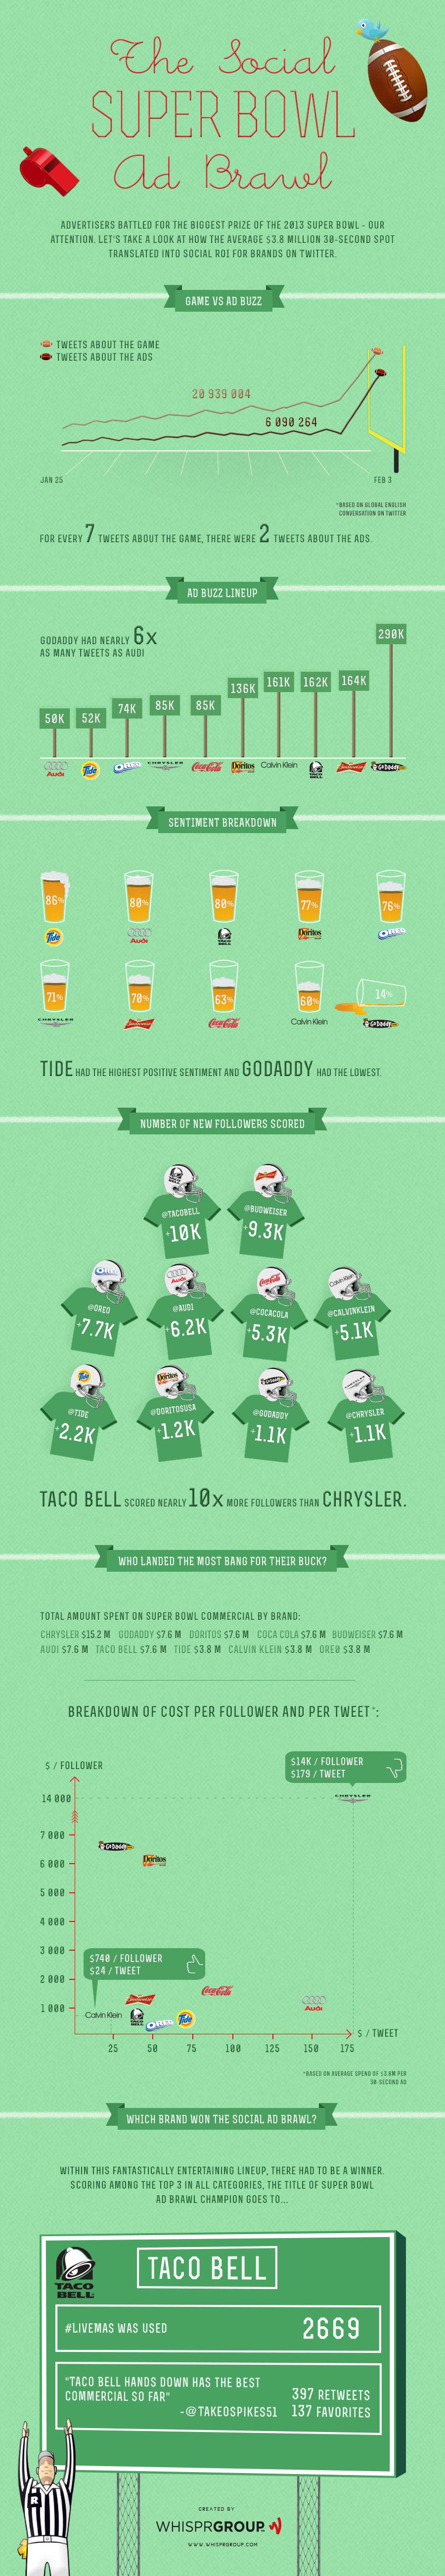 Superbowl Tweet Infographic Statistics